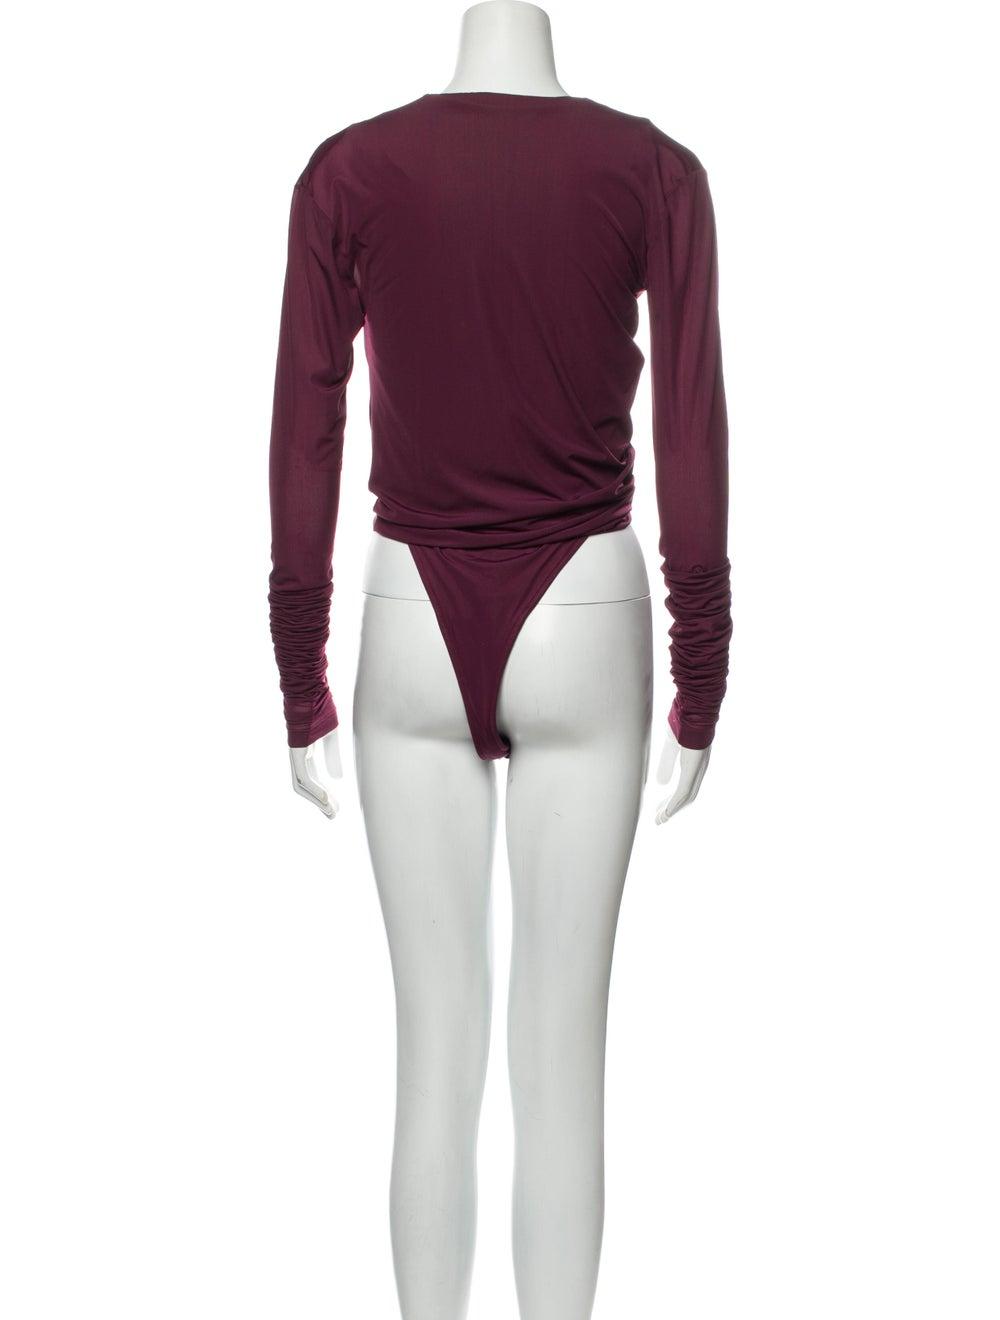 Y/Project Condom Bodysuit Crew Neck Bodysuit - image 3